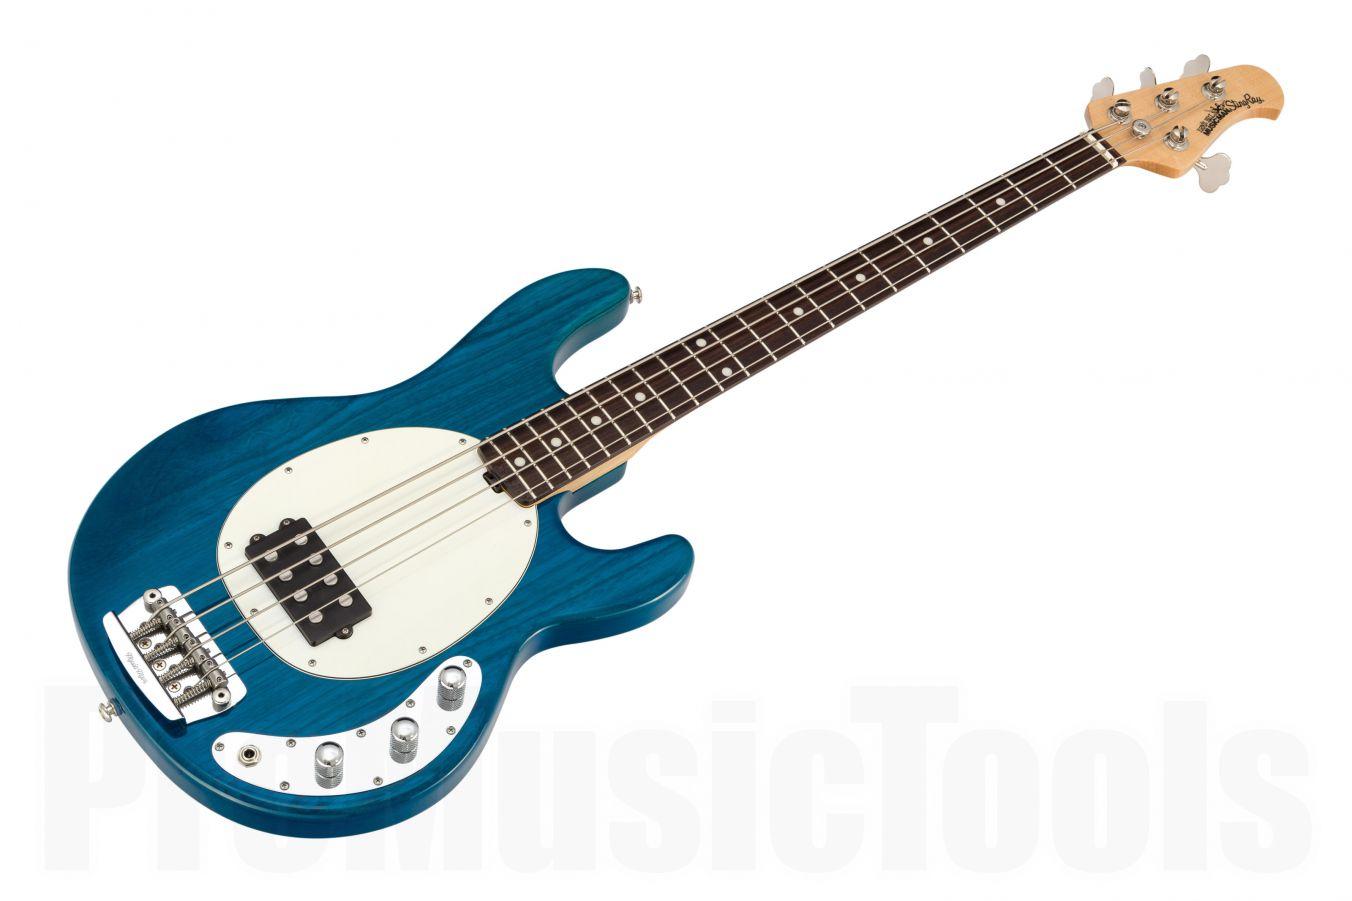 Music Man USA Stingray 4 2EQ TB - Translucent Blue RW